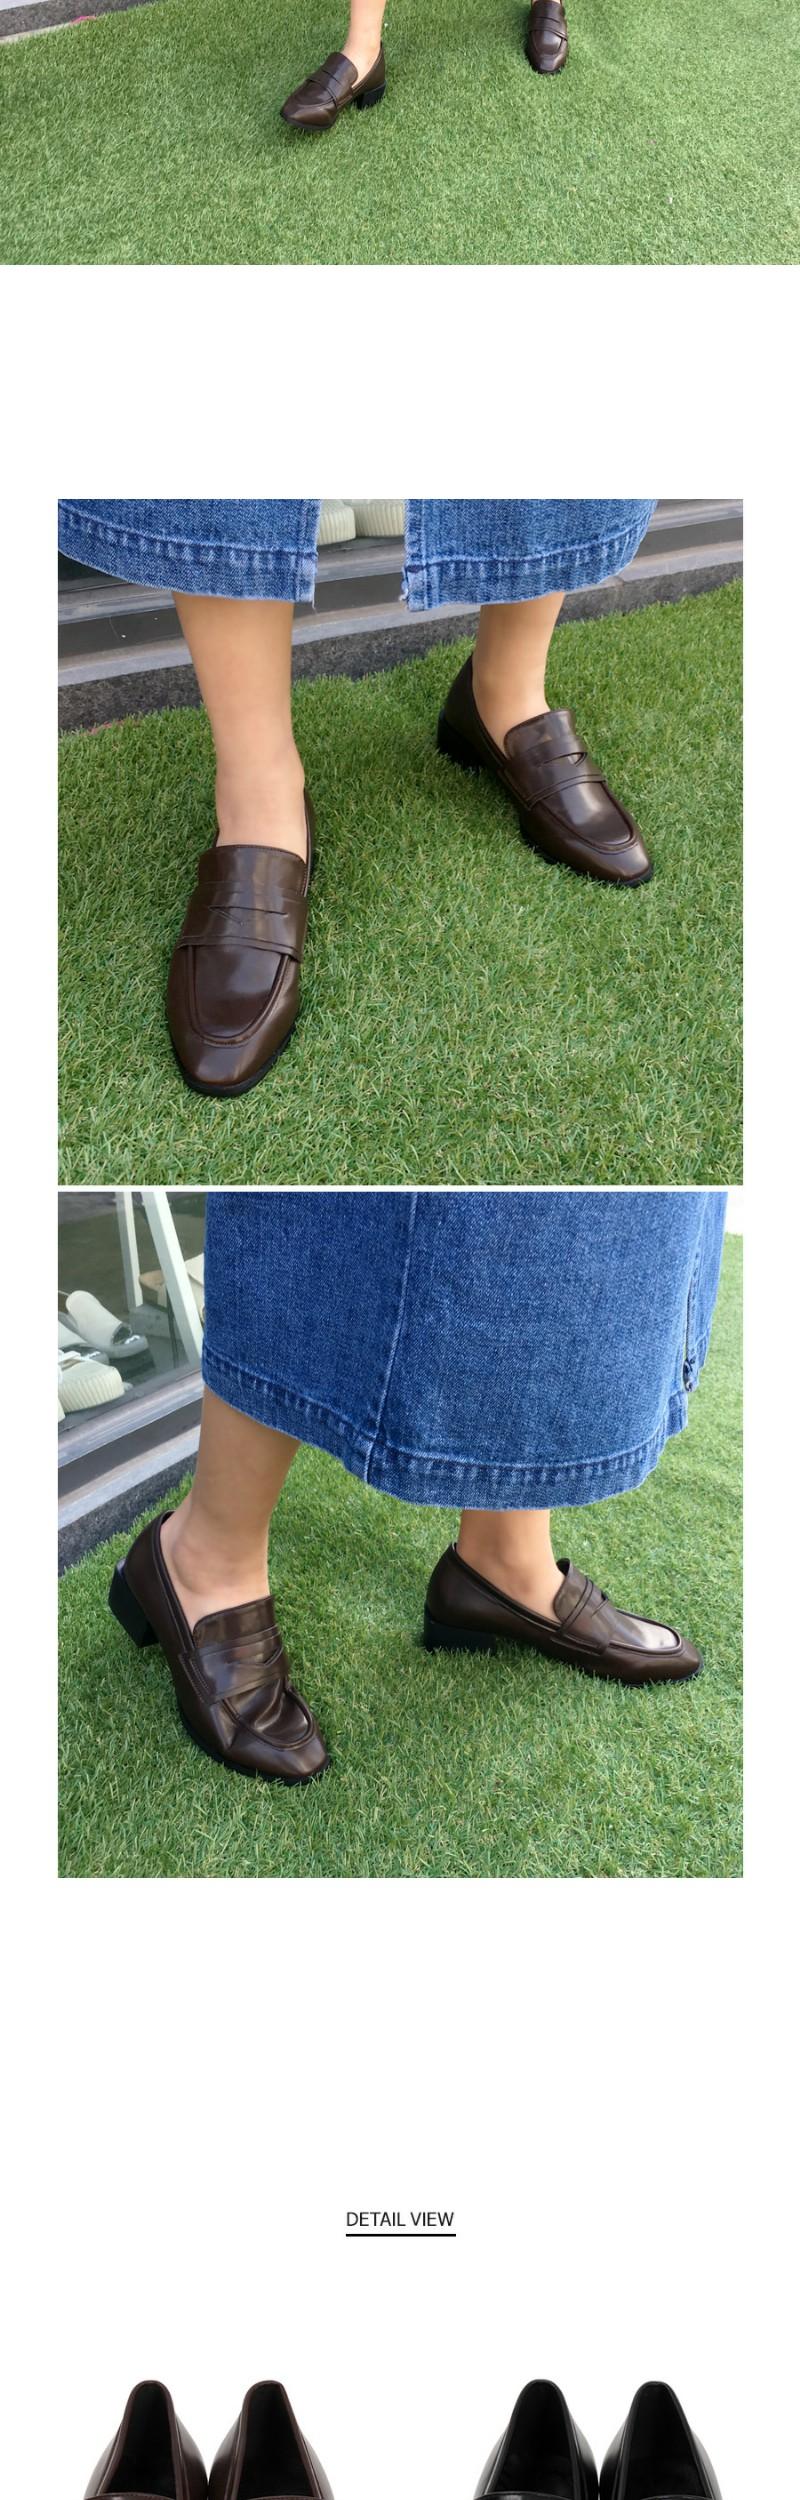 Clazzi penny loafer_K (size : 230,235,240,245,250)